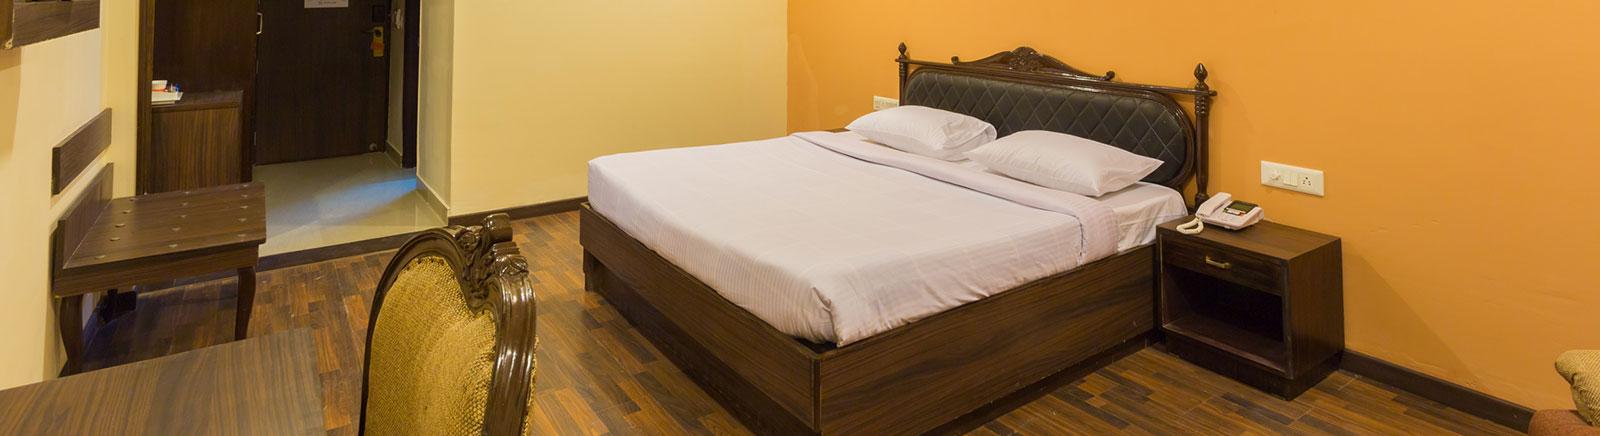 Ginger Katra Hotel Rooms